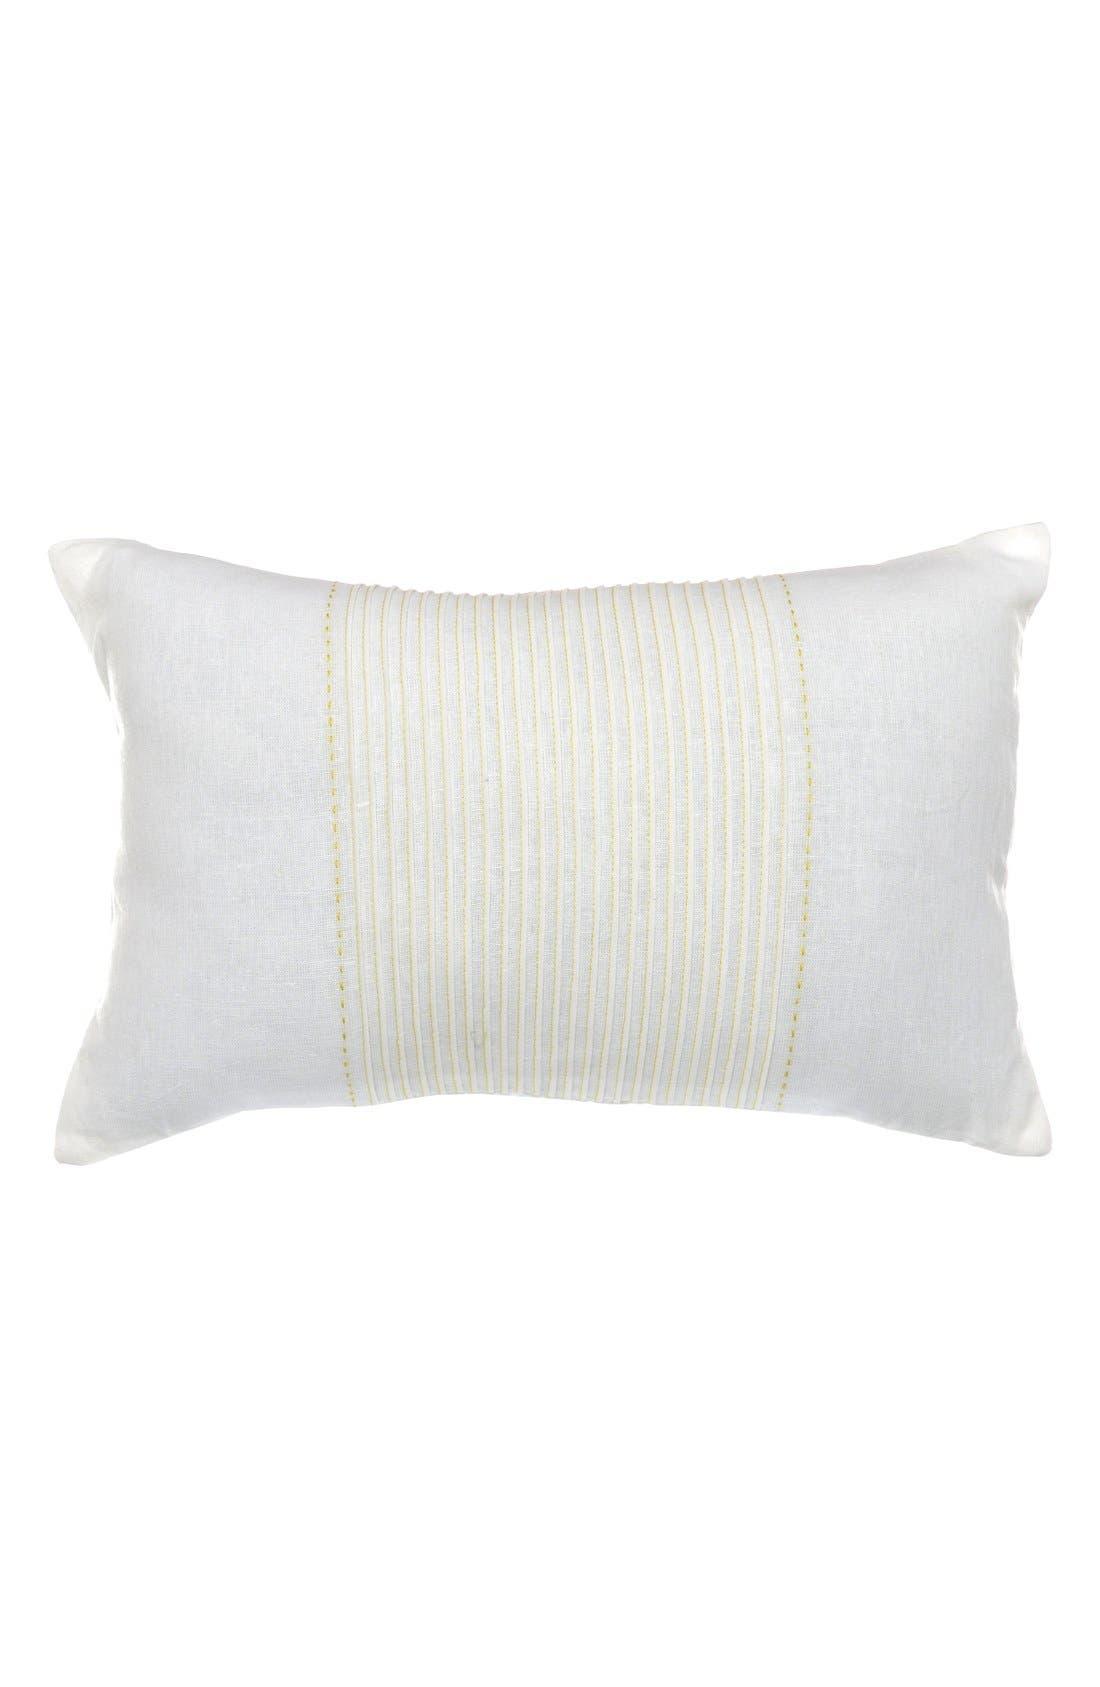 Main Image - Nautica 'Delwood - Breakfast' Linen & Cotton Accent Pillow